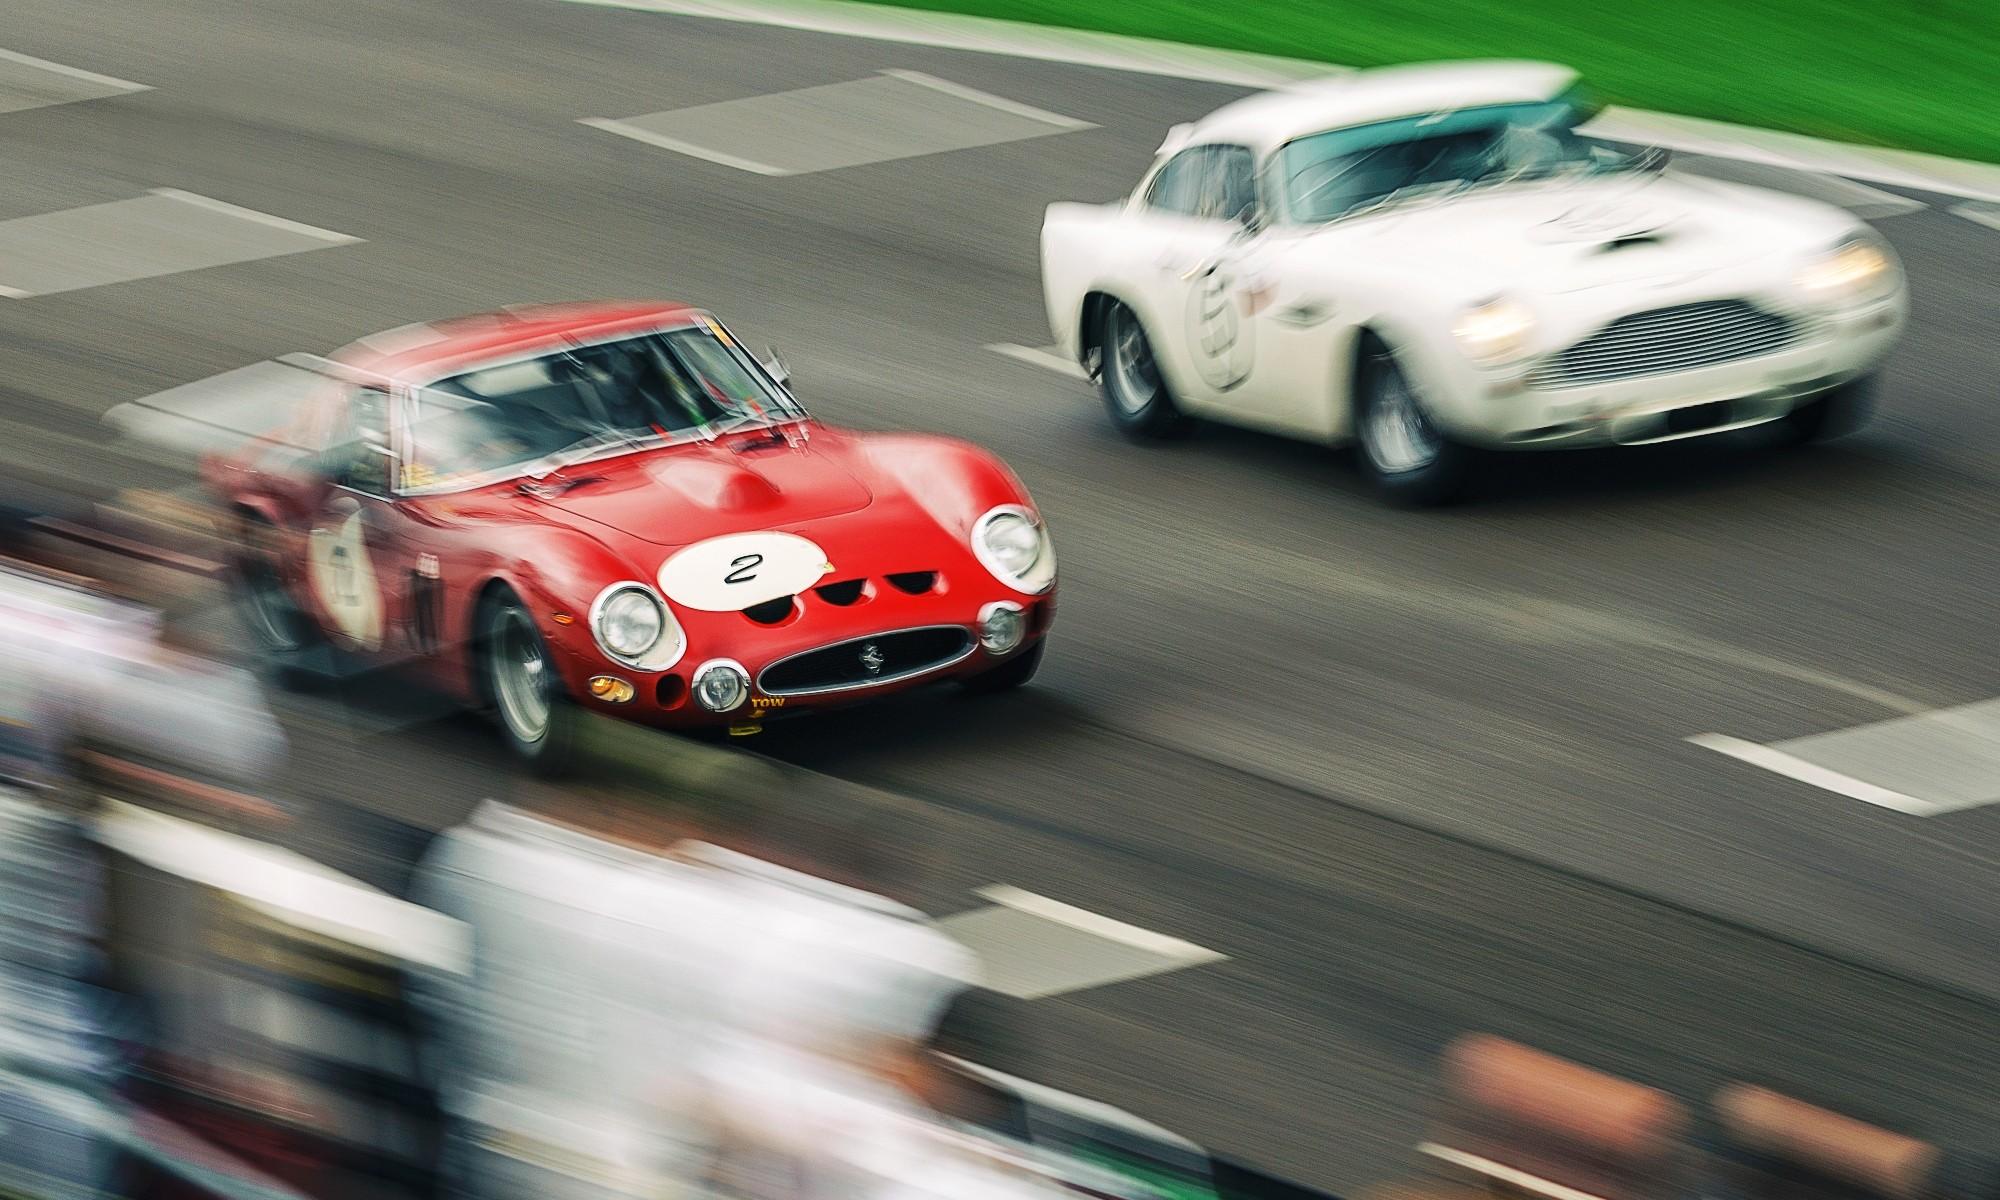 A Ferrari 250 GTO overtakes an Aston Martin DB4 GT